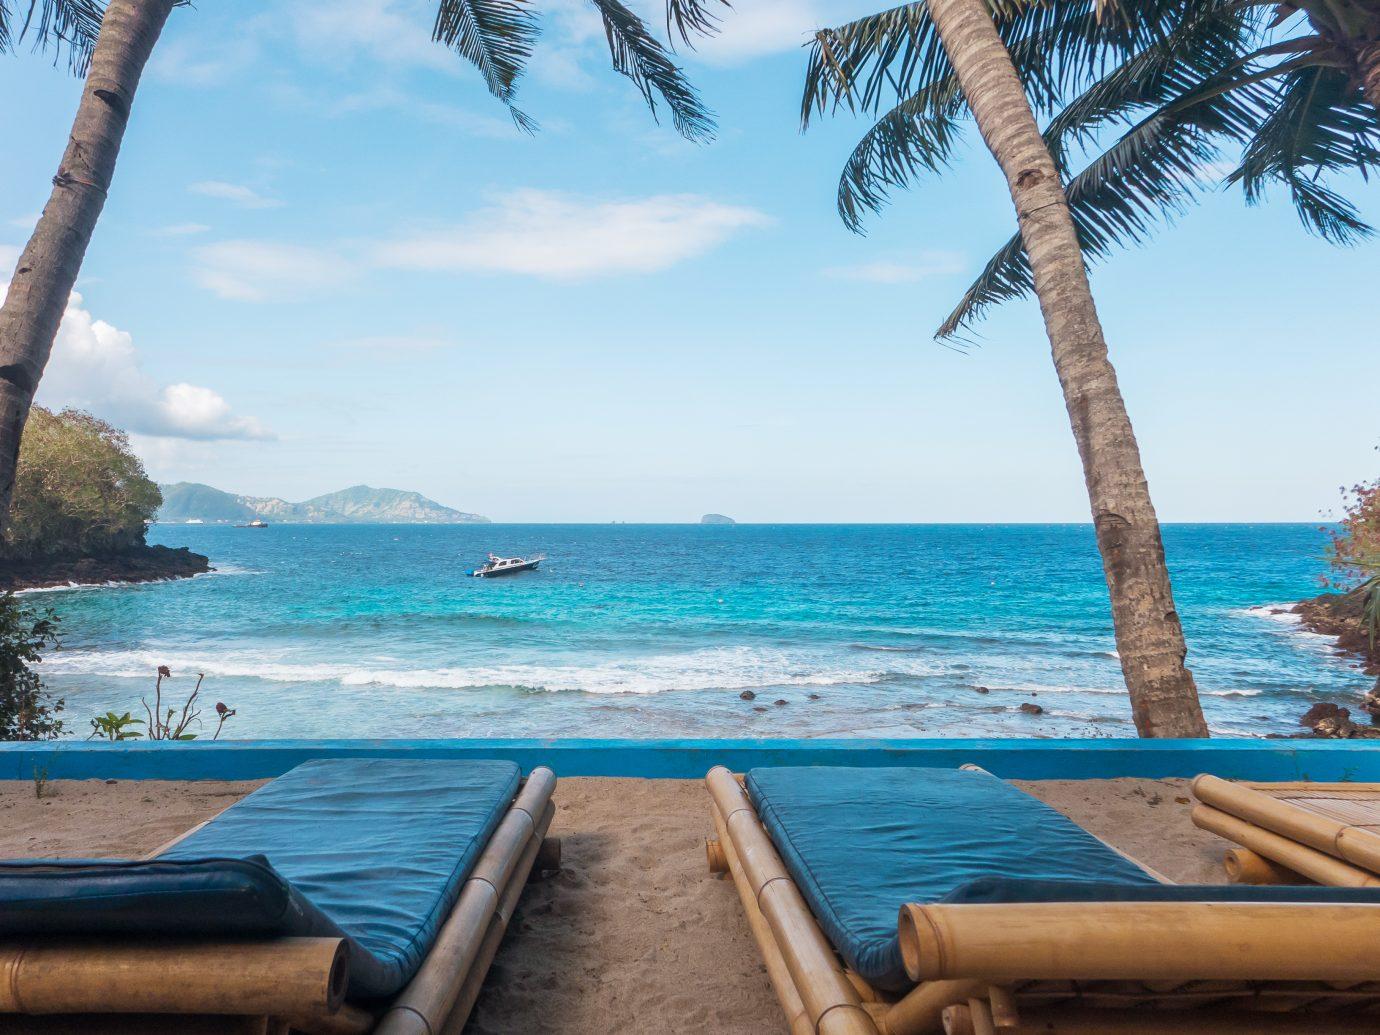 Secret beach at padang bay, Bali